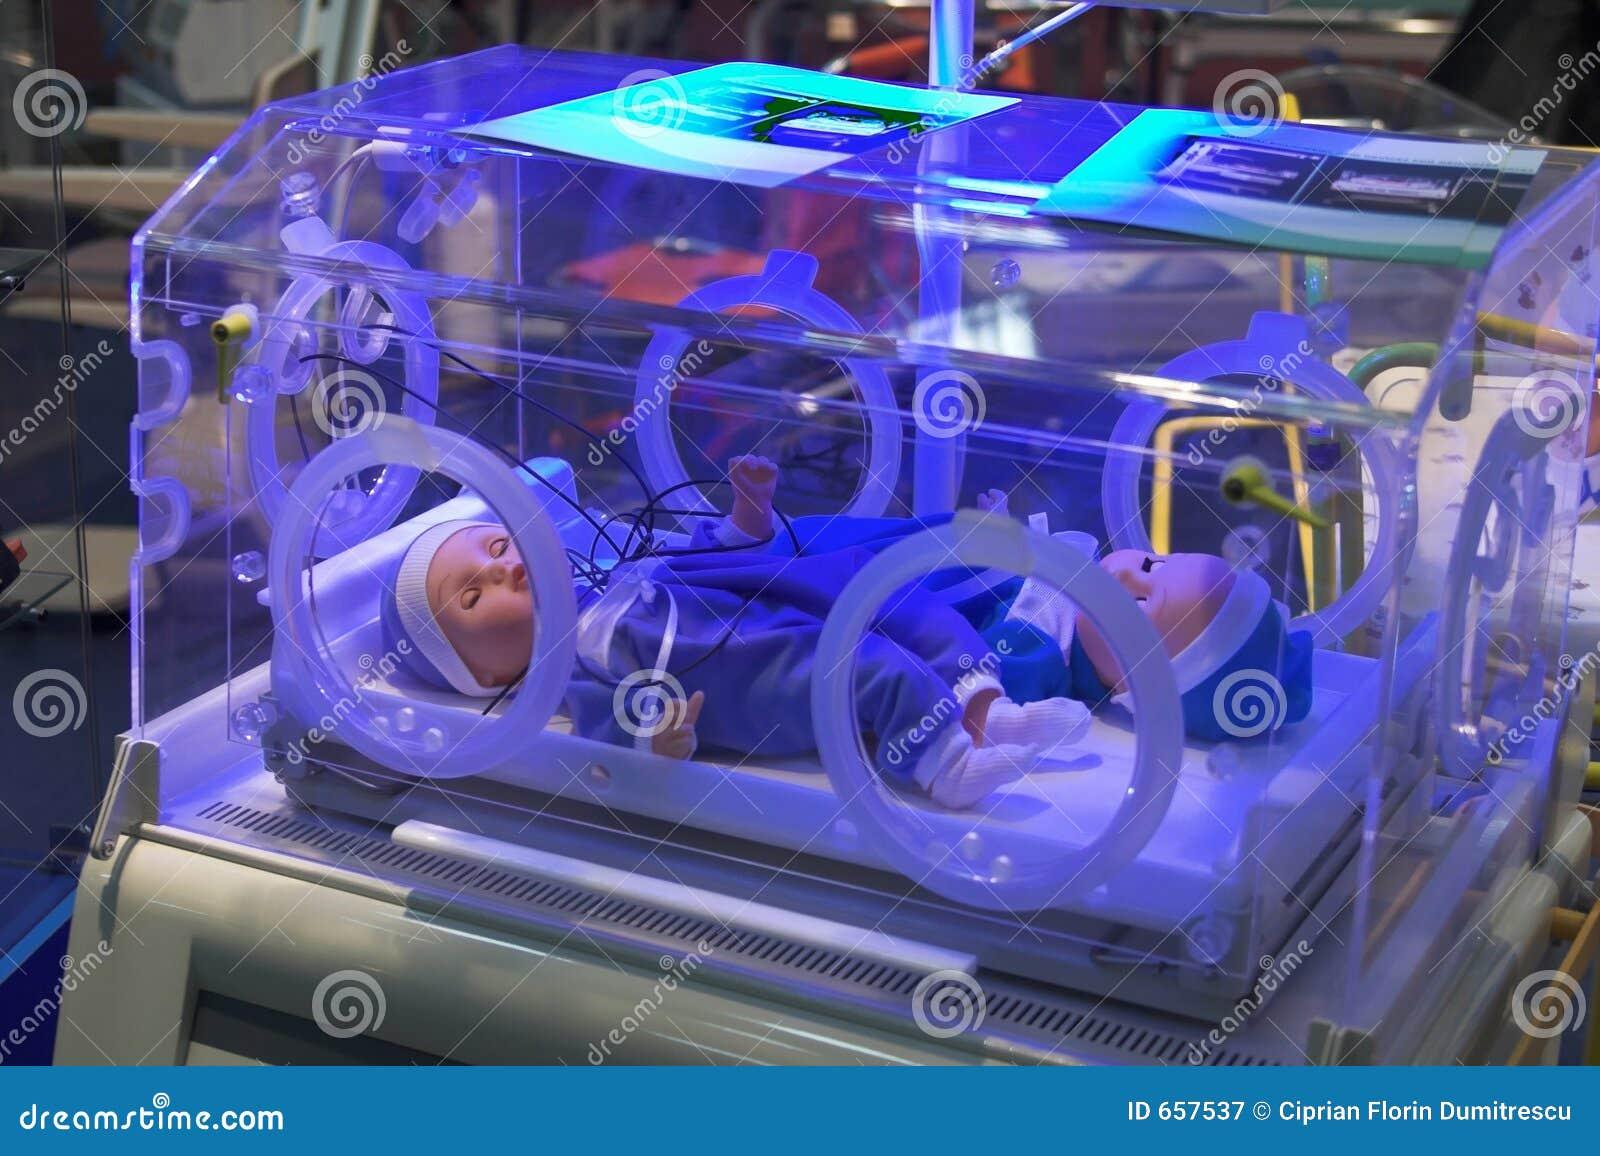 Medical Incubator Royalty Free Stock Photography Image